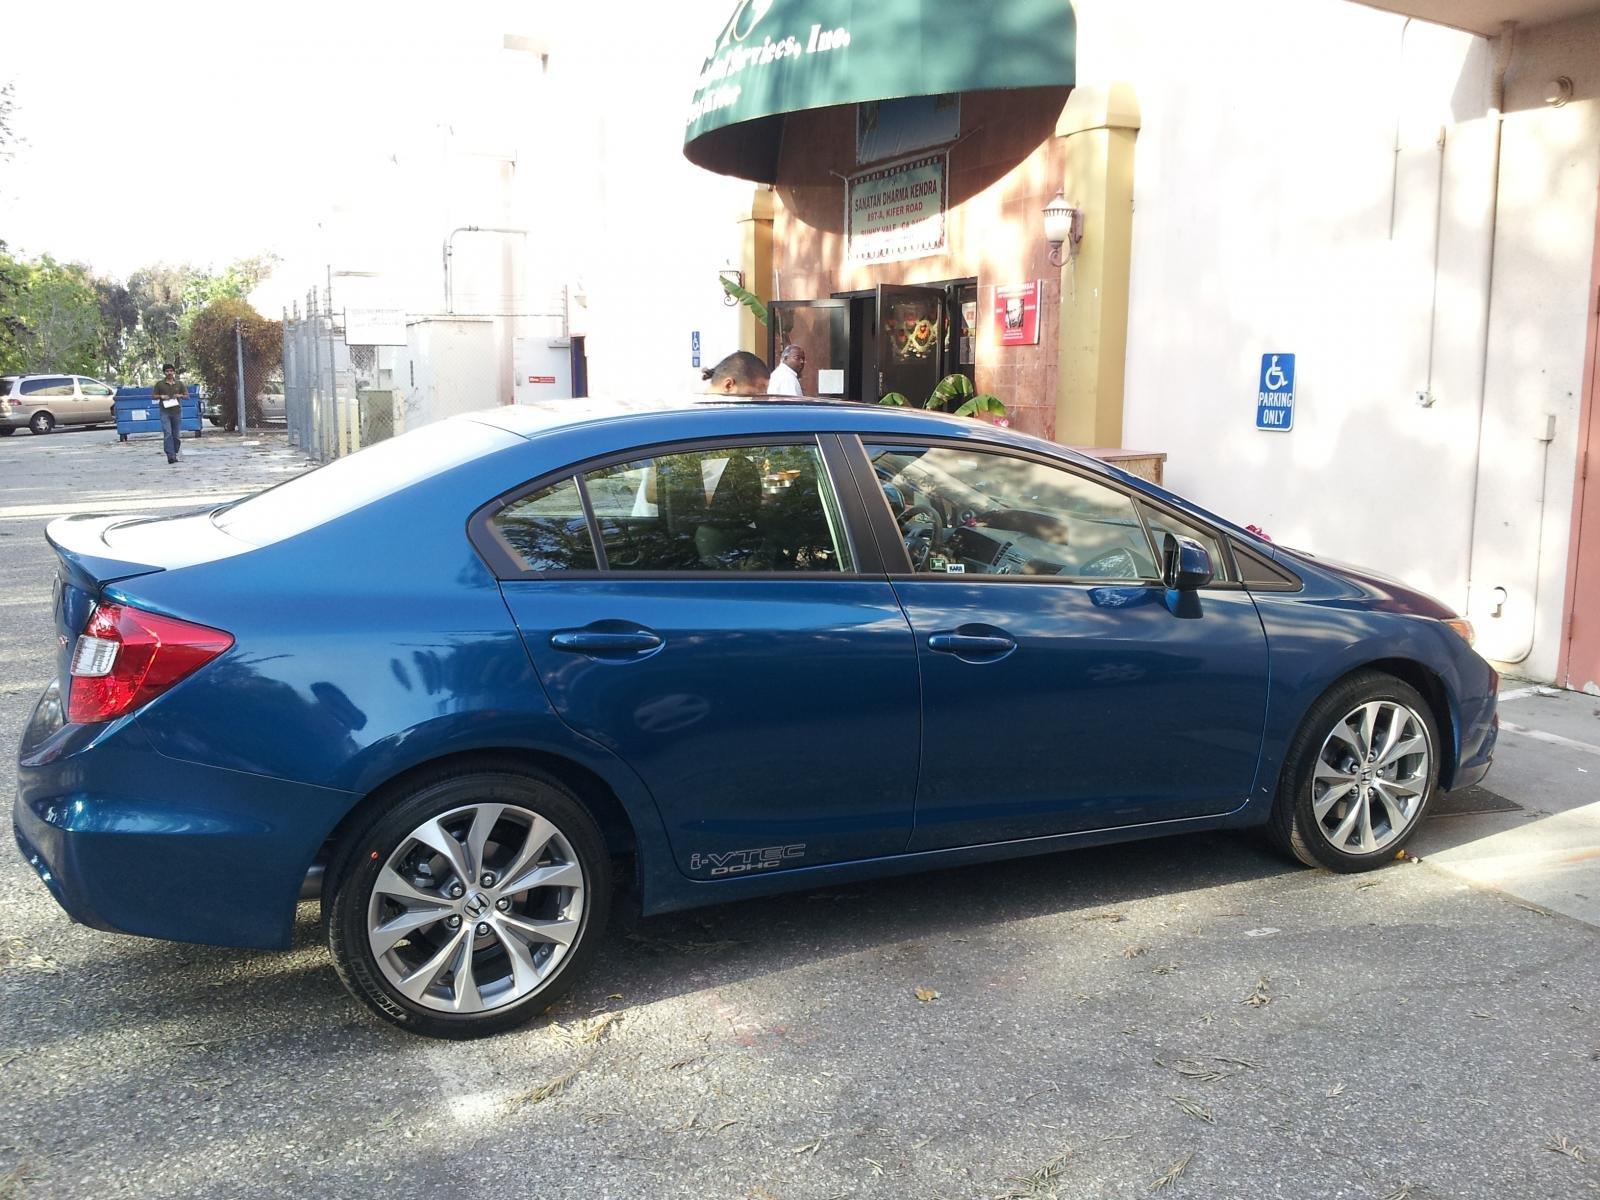 2012 Civic Si Sedan. Dyno Blue Pearl-side2.jpg